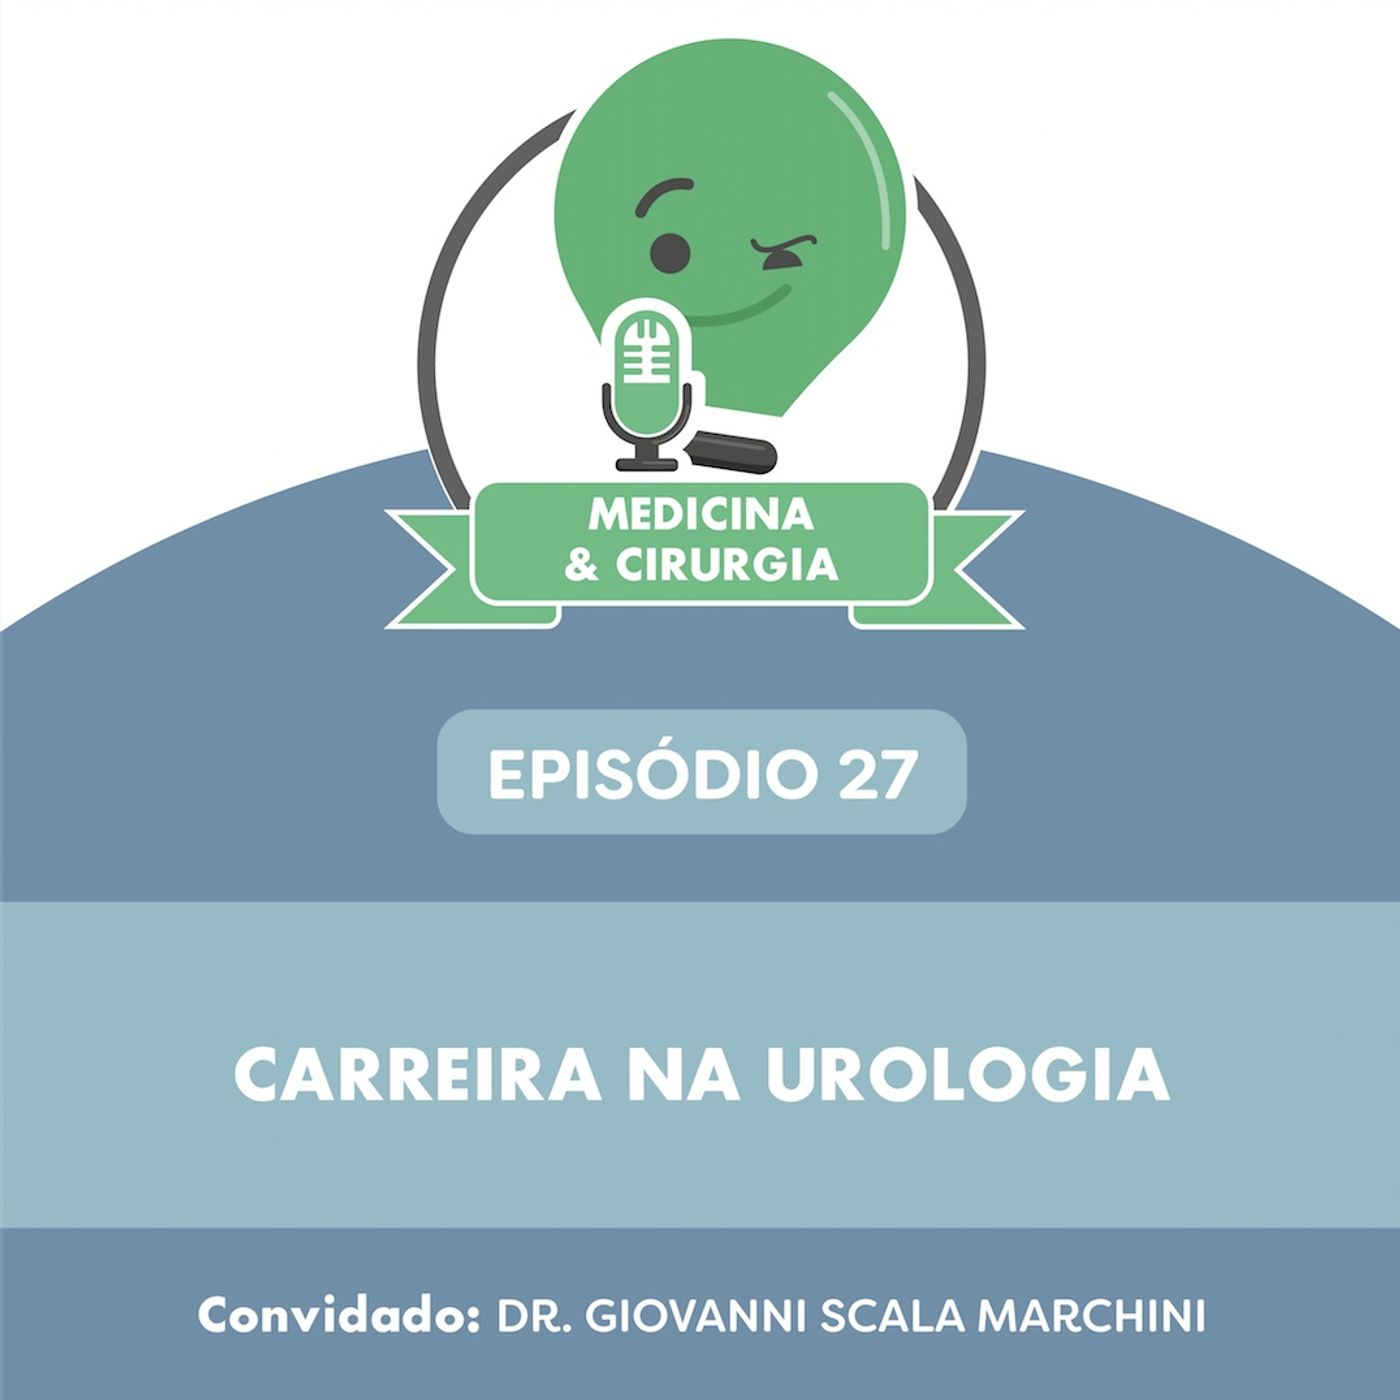 27 - Carreira na urologia